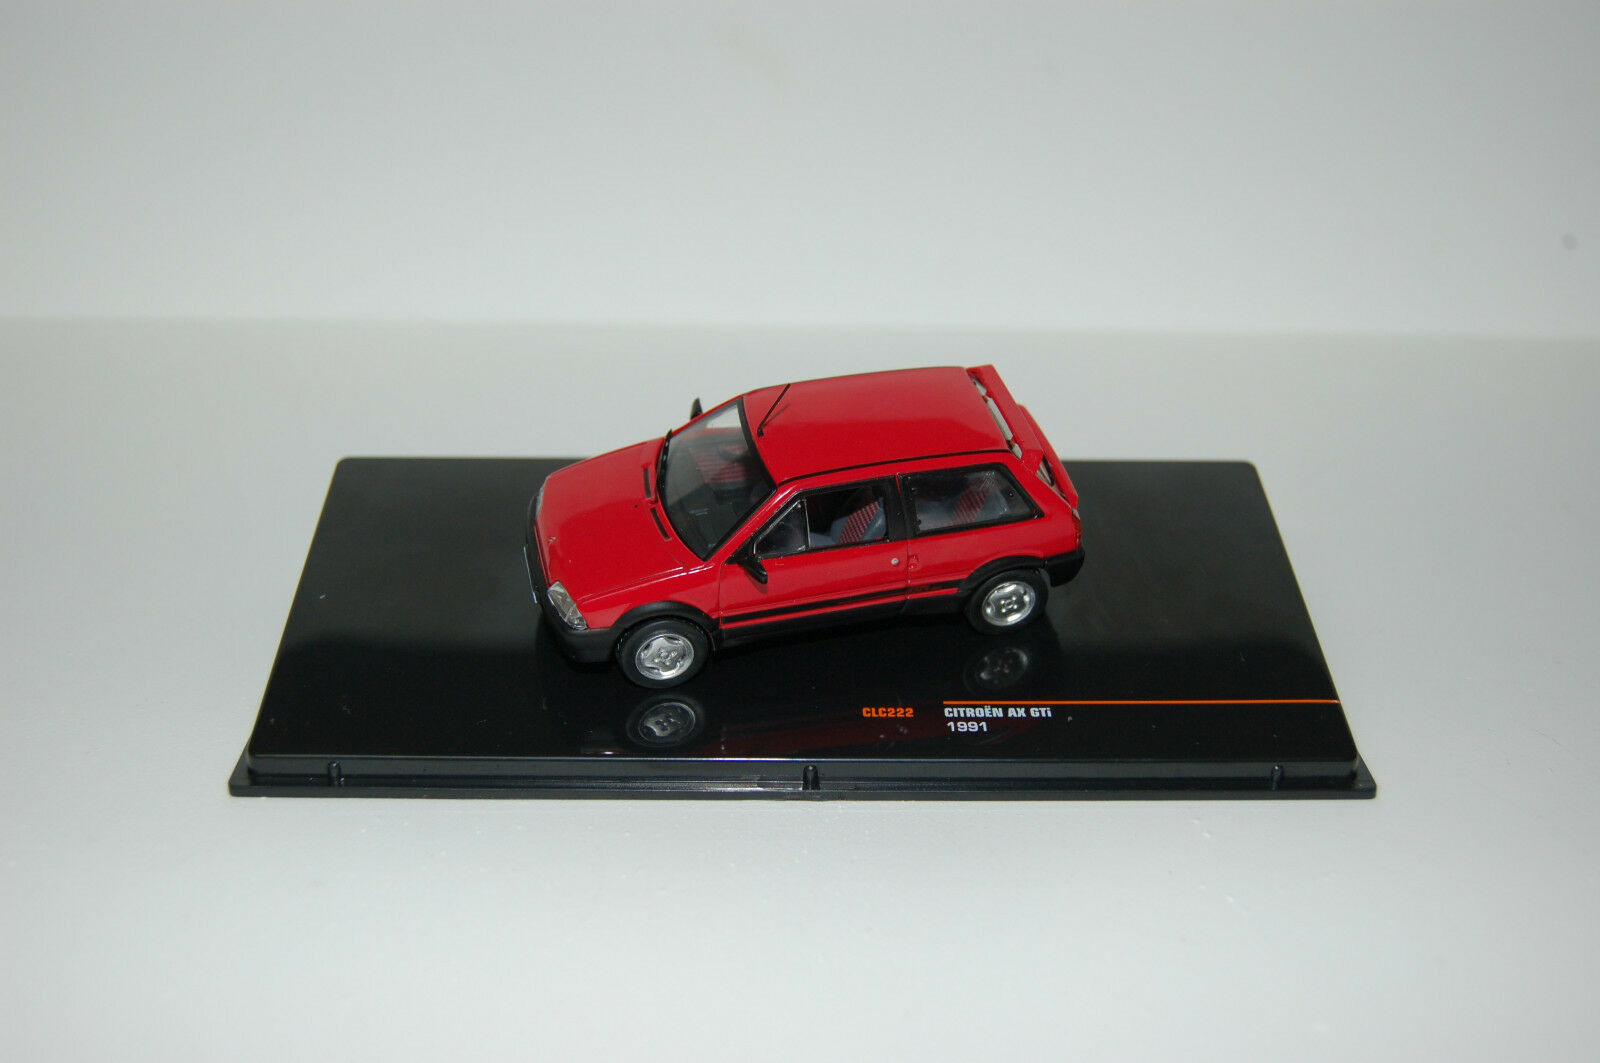 Citroën AX GTI Red IXO - IX IX IX 181769 - Echelle 1 43 NEWS AOUT 2018 e7c11c